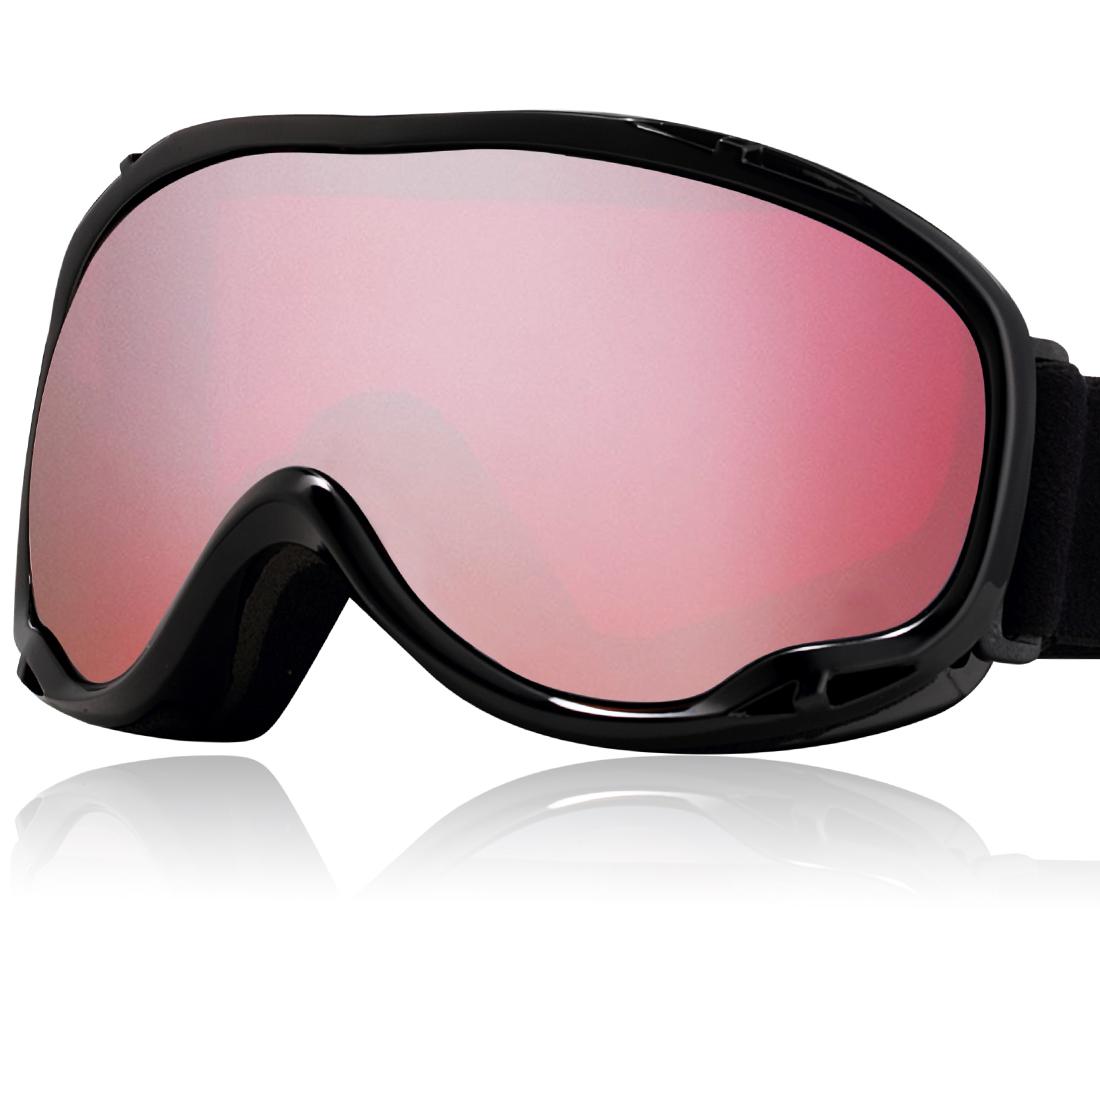 Uxcell Ski Glasses Snowboard Goggles UV400 Protect Anti-fog YH607 Vermilion